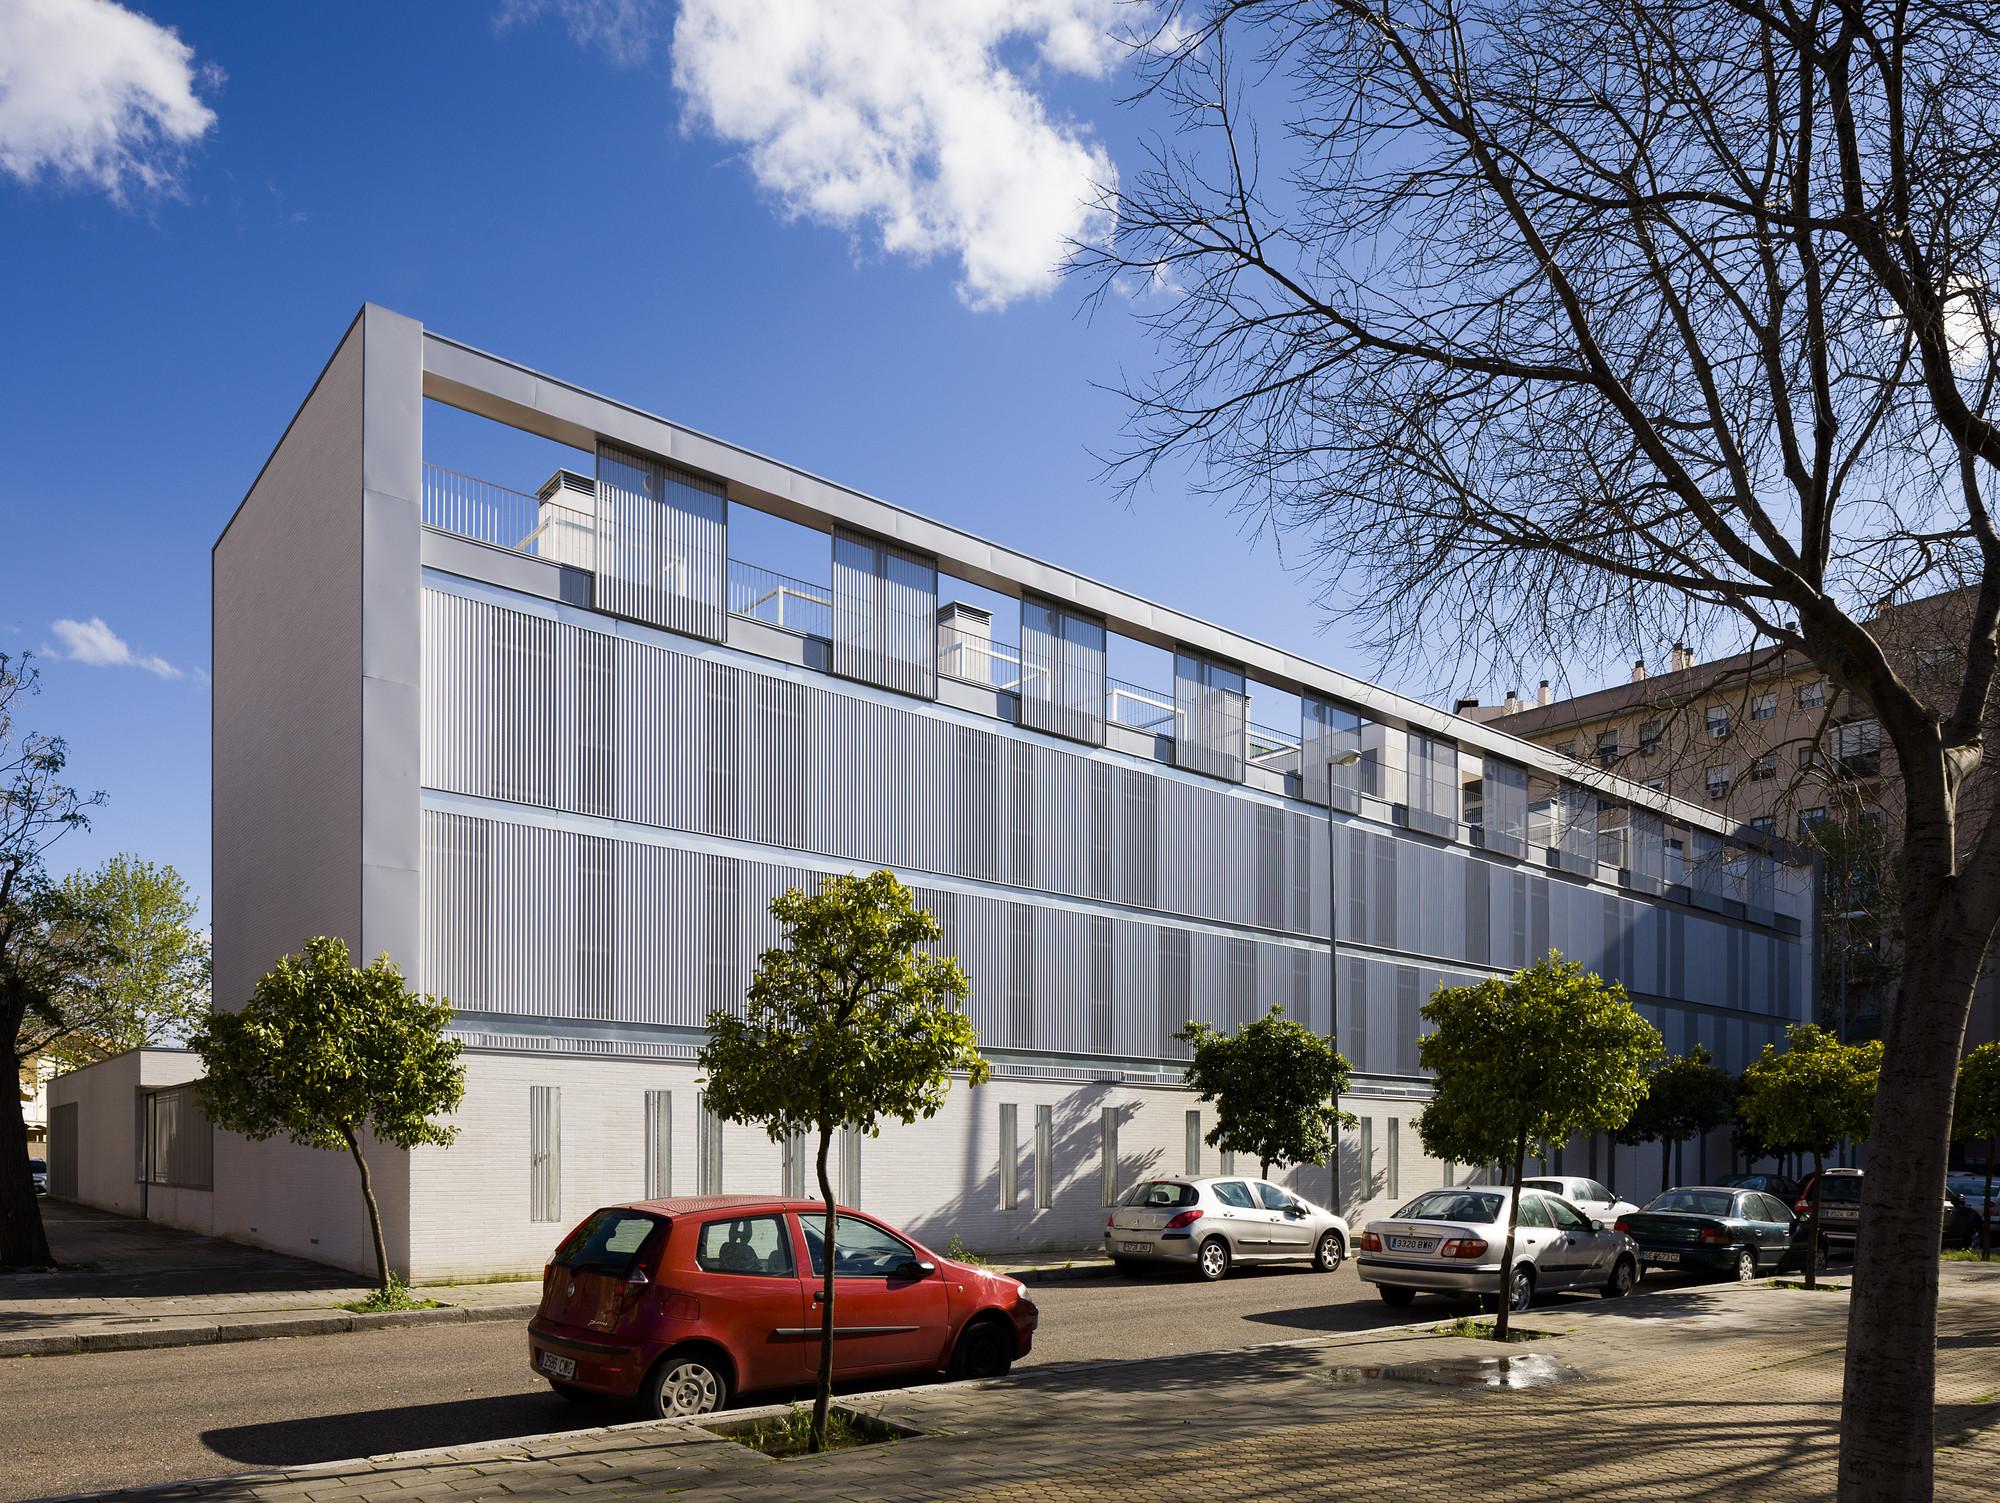 Seville University Residence Hall / Donaire Arquitectos + SSW Arquitectos, © Fernando Alda